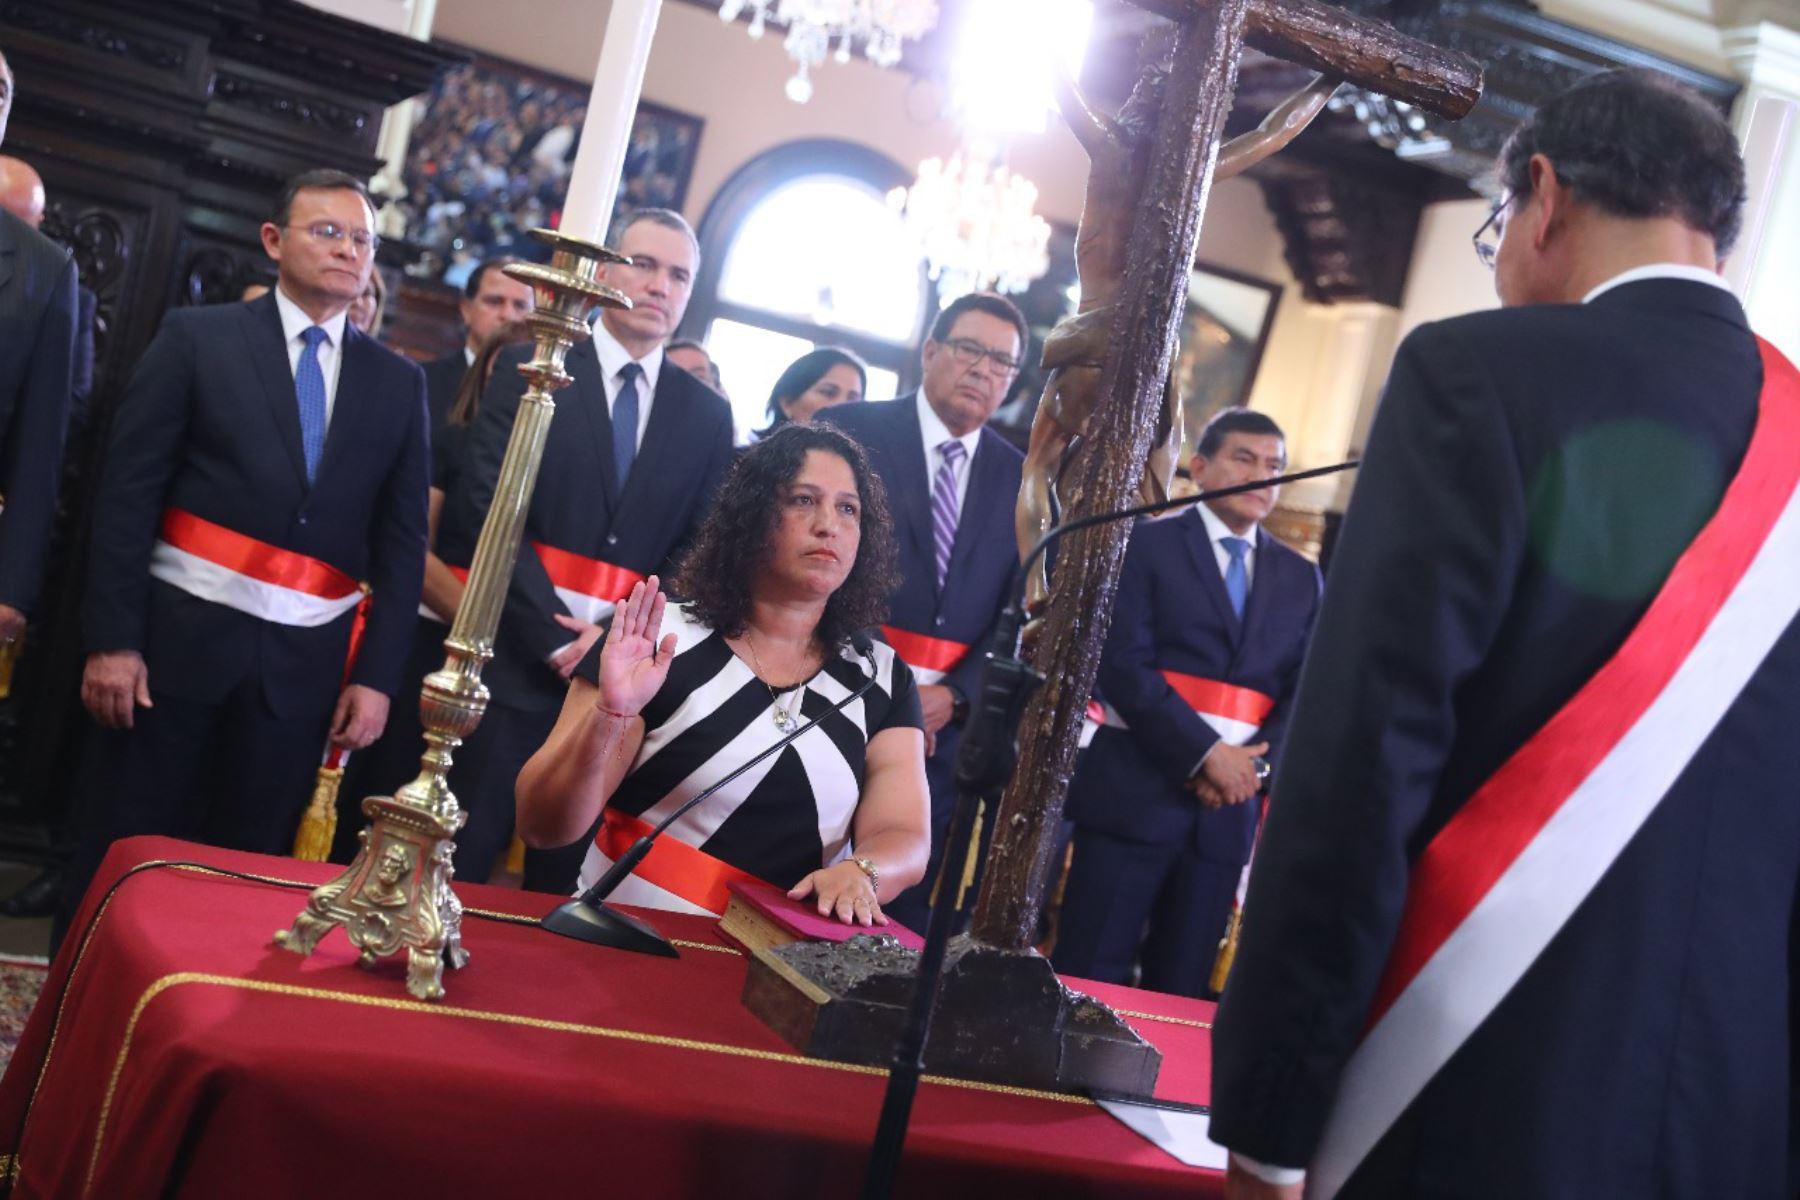 Fabiola Muñoz juramenta como ministra de Agricultura y Riego. Foto: ANDINA/Prensa Presidencia